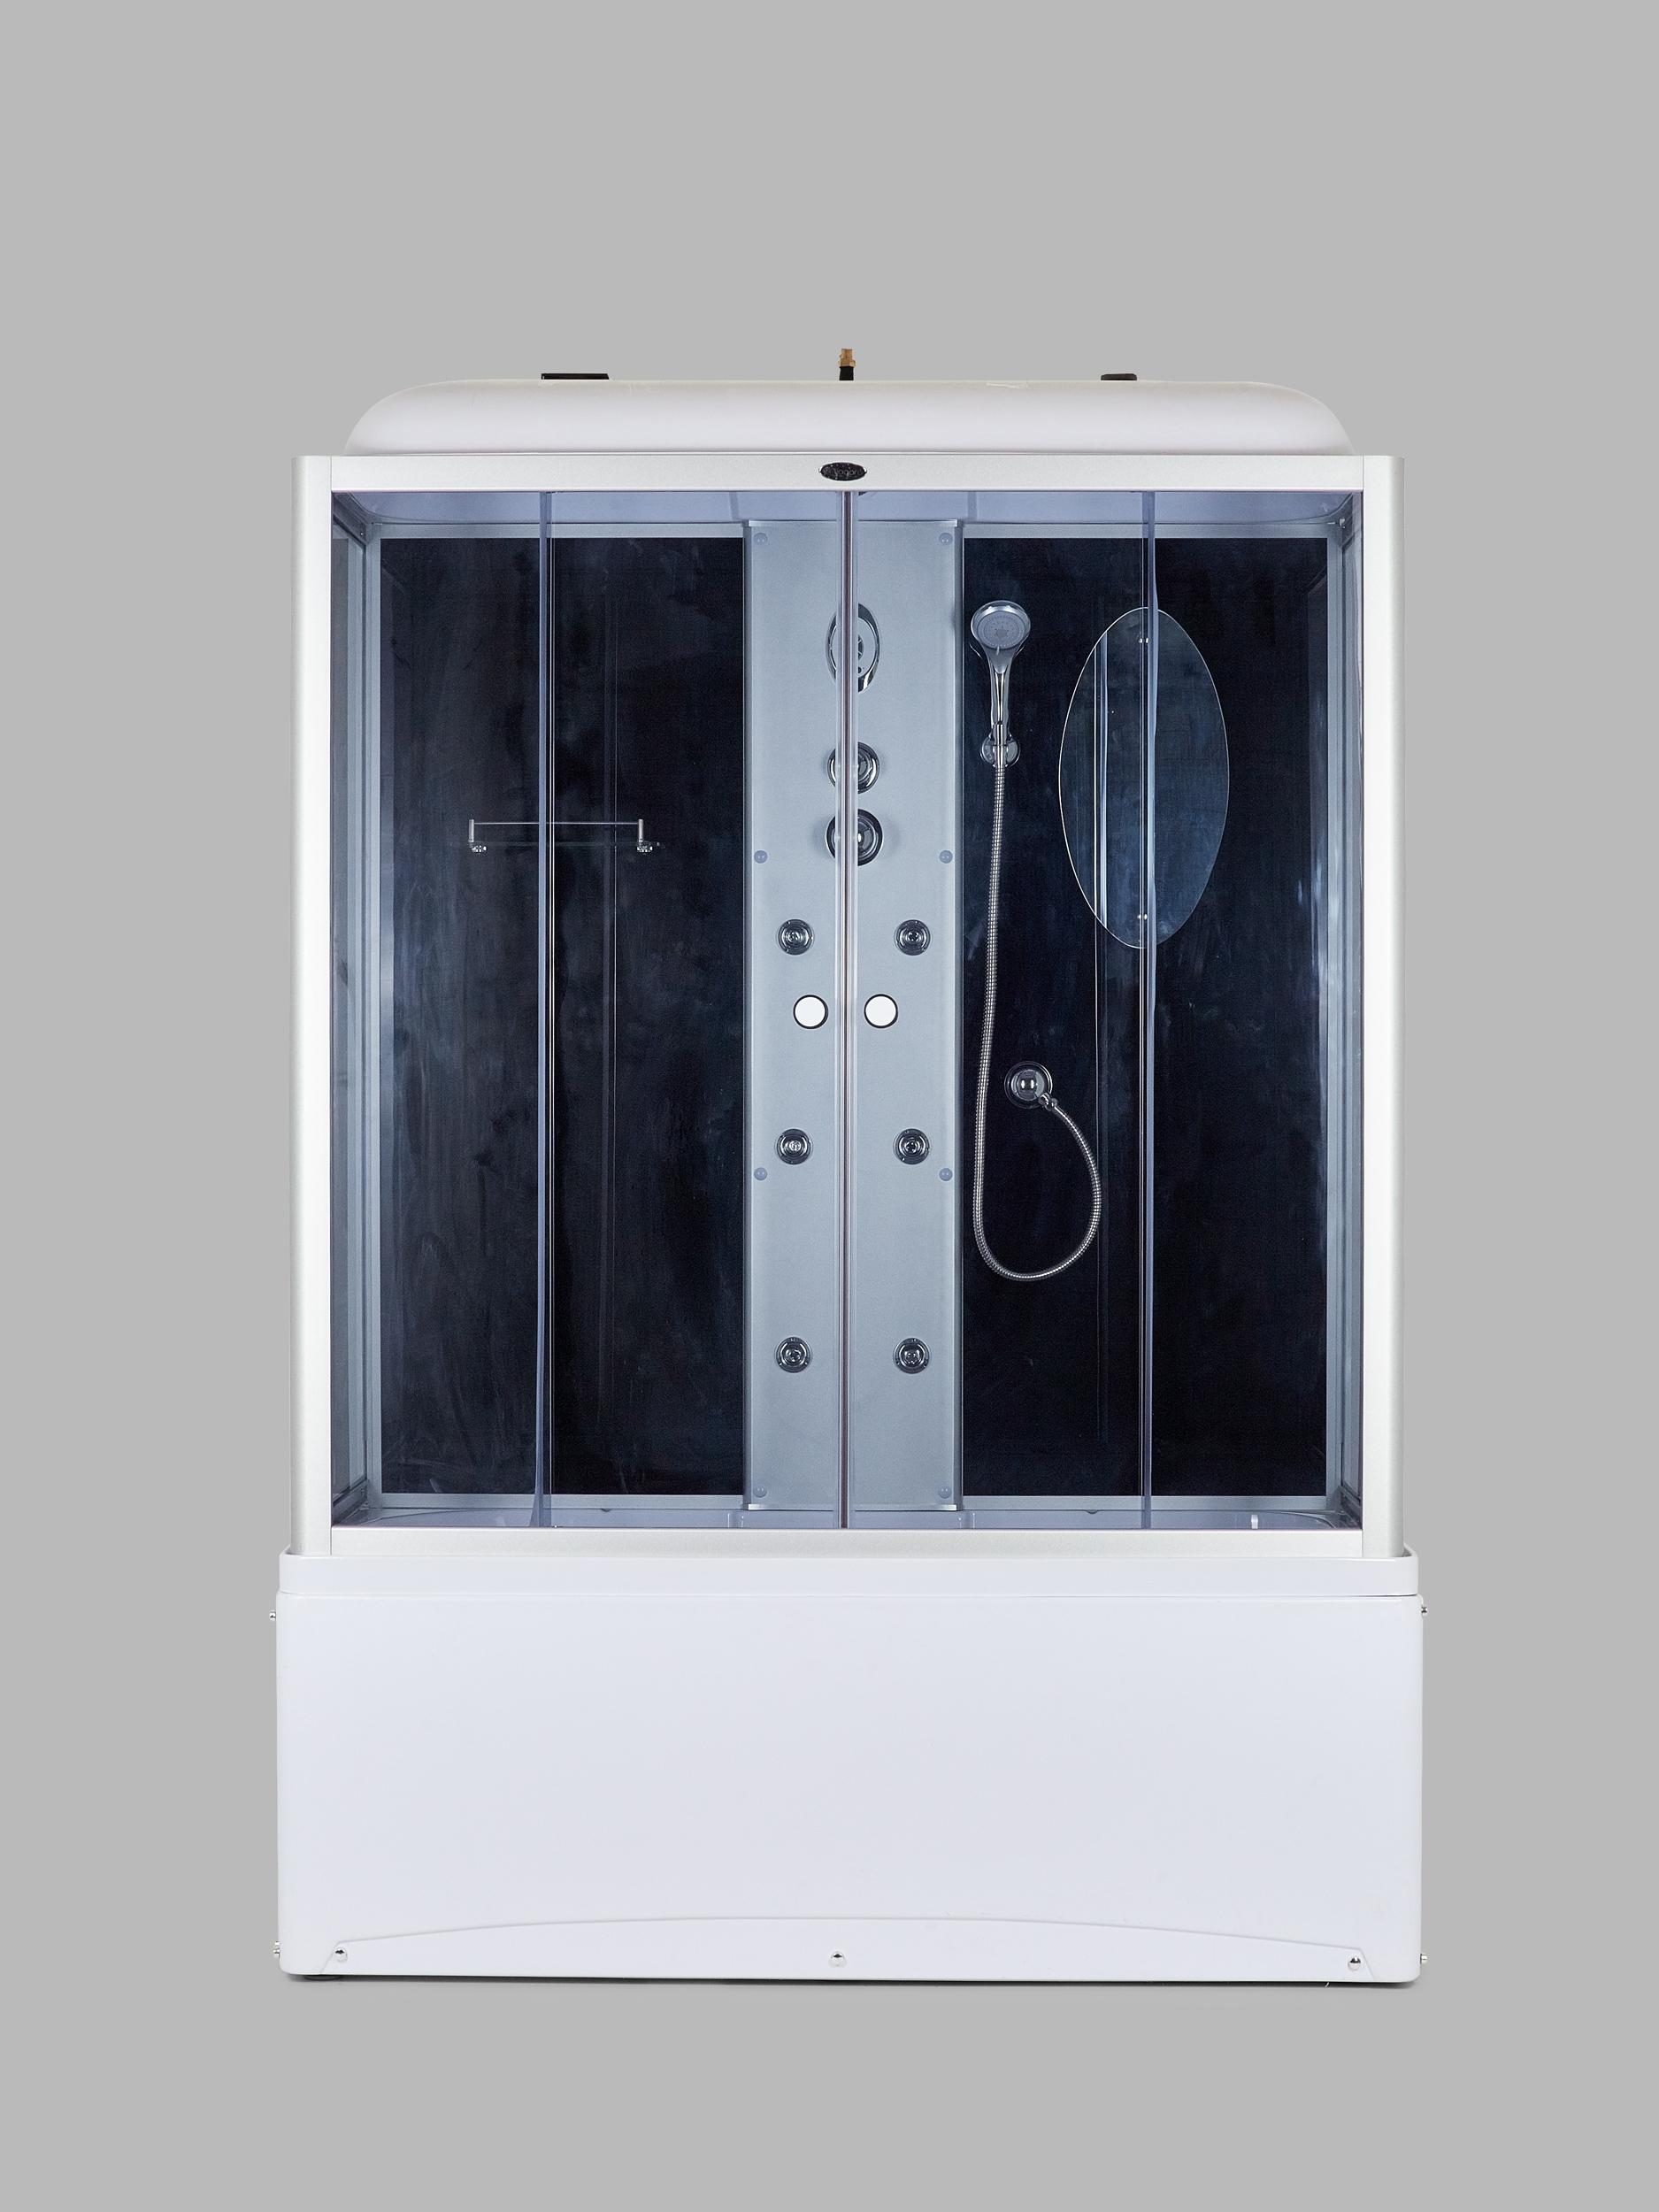 Душевая кабина Niagara NG-5170, 170*75*218, без бани